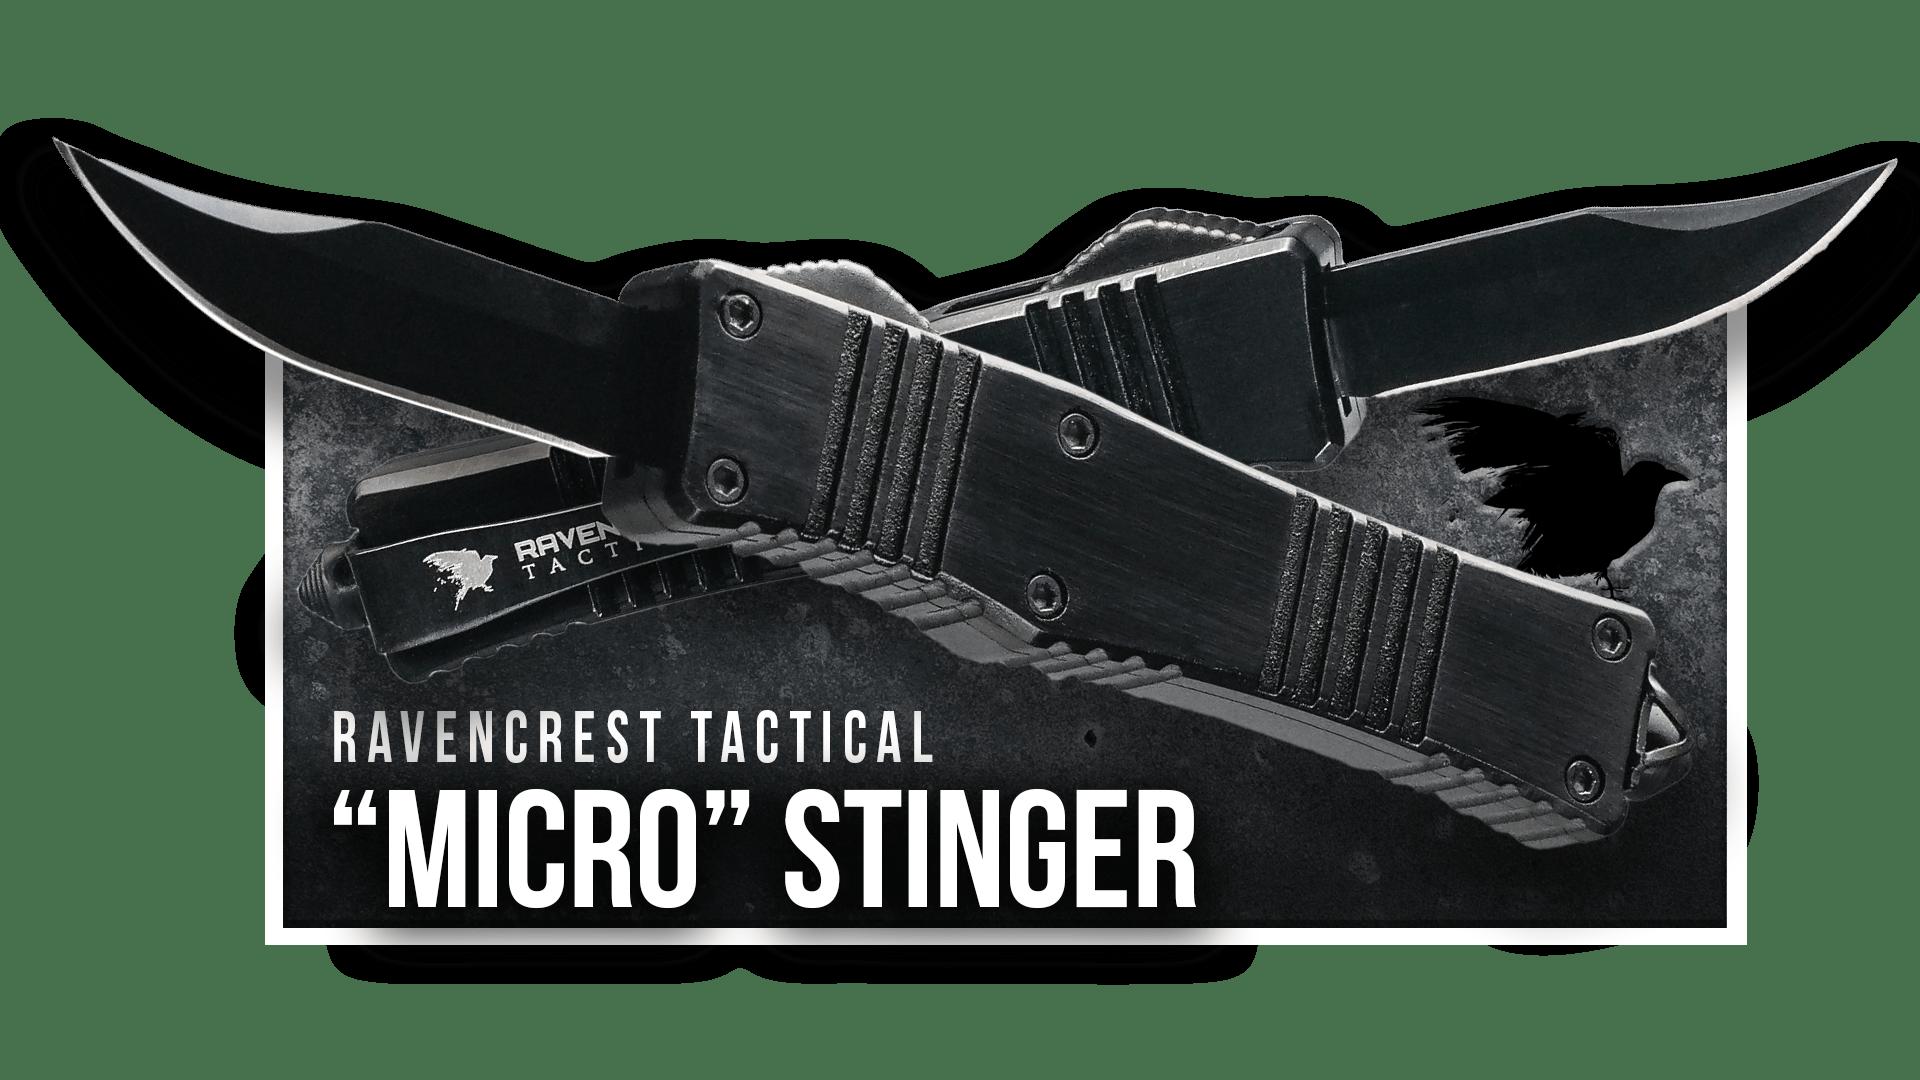 OTF Knife - Micro Stinger - RavenCrest Tactical